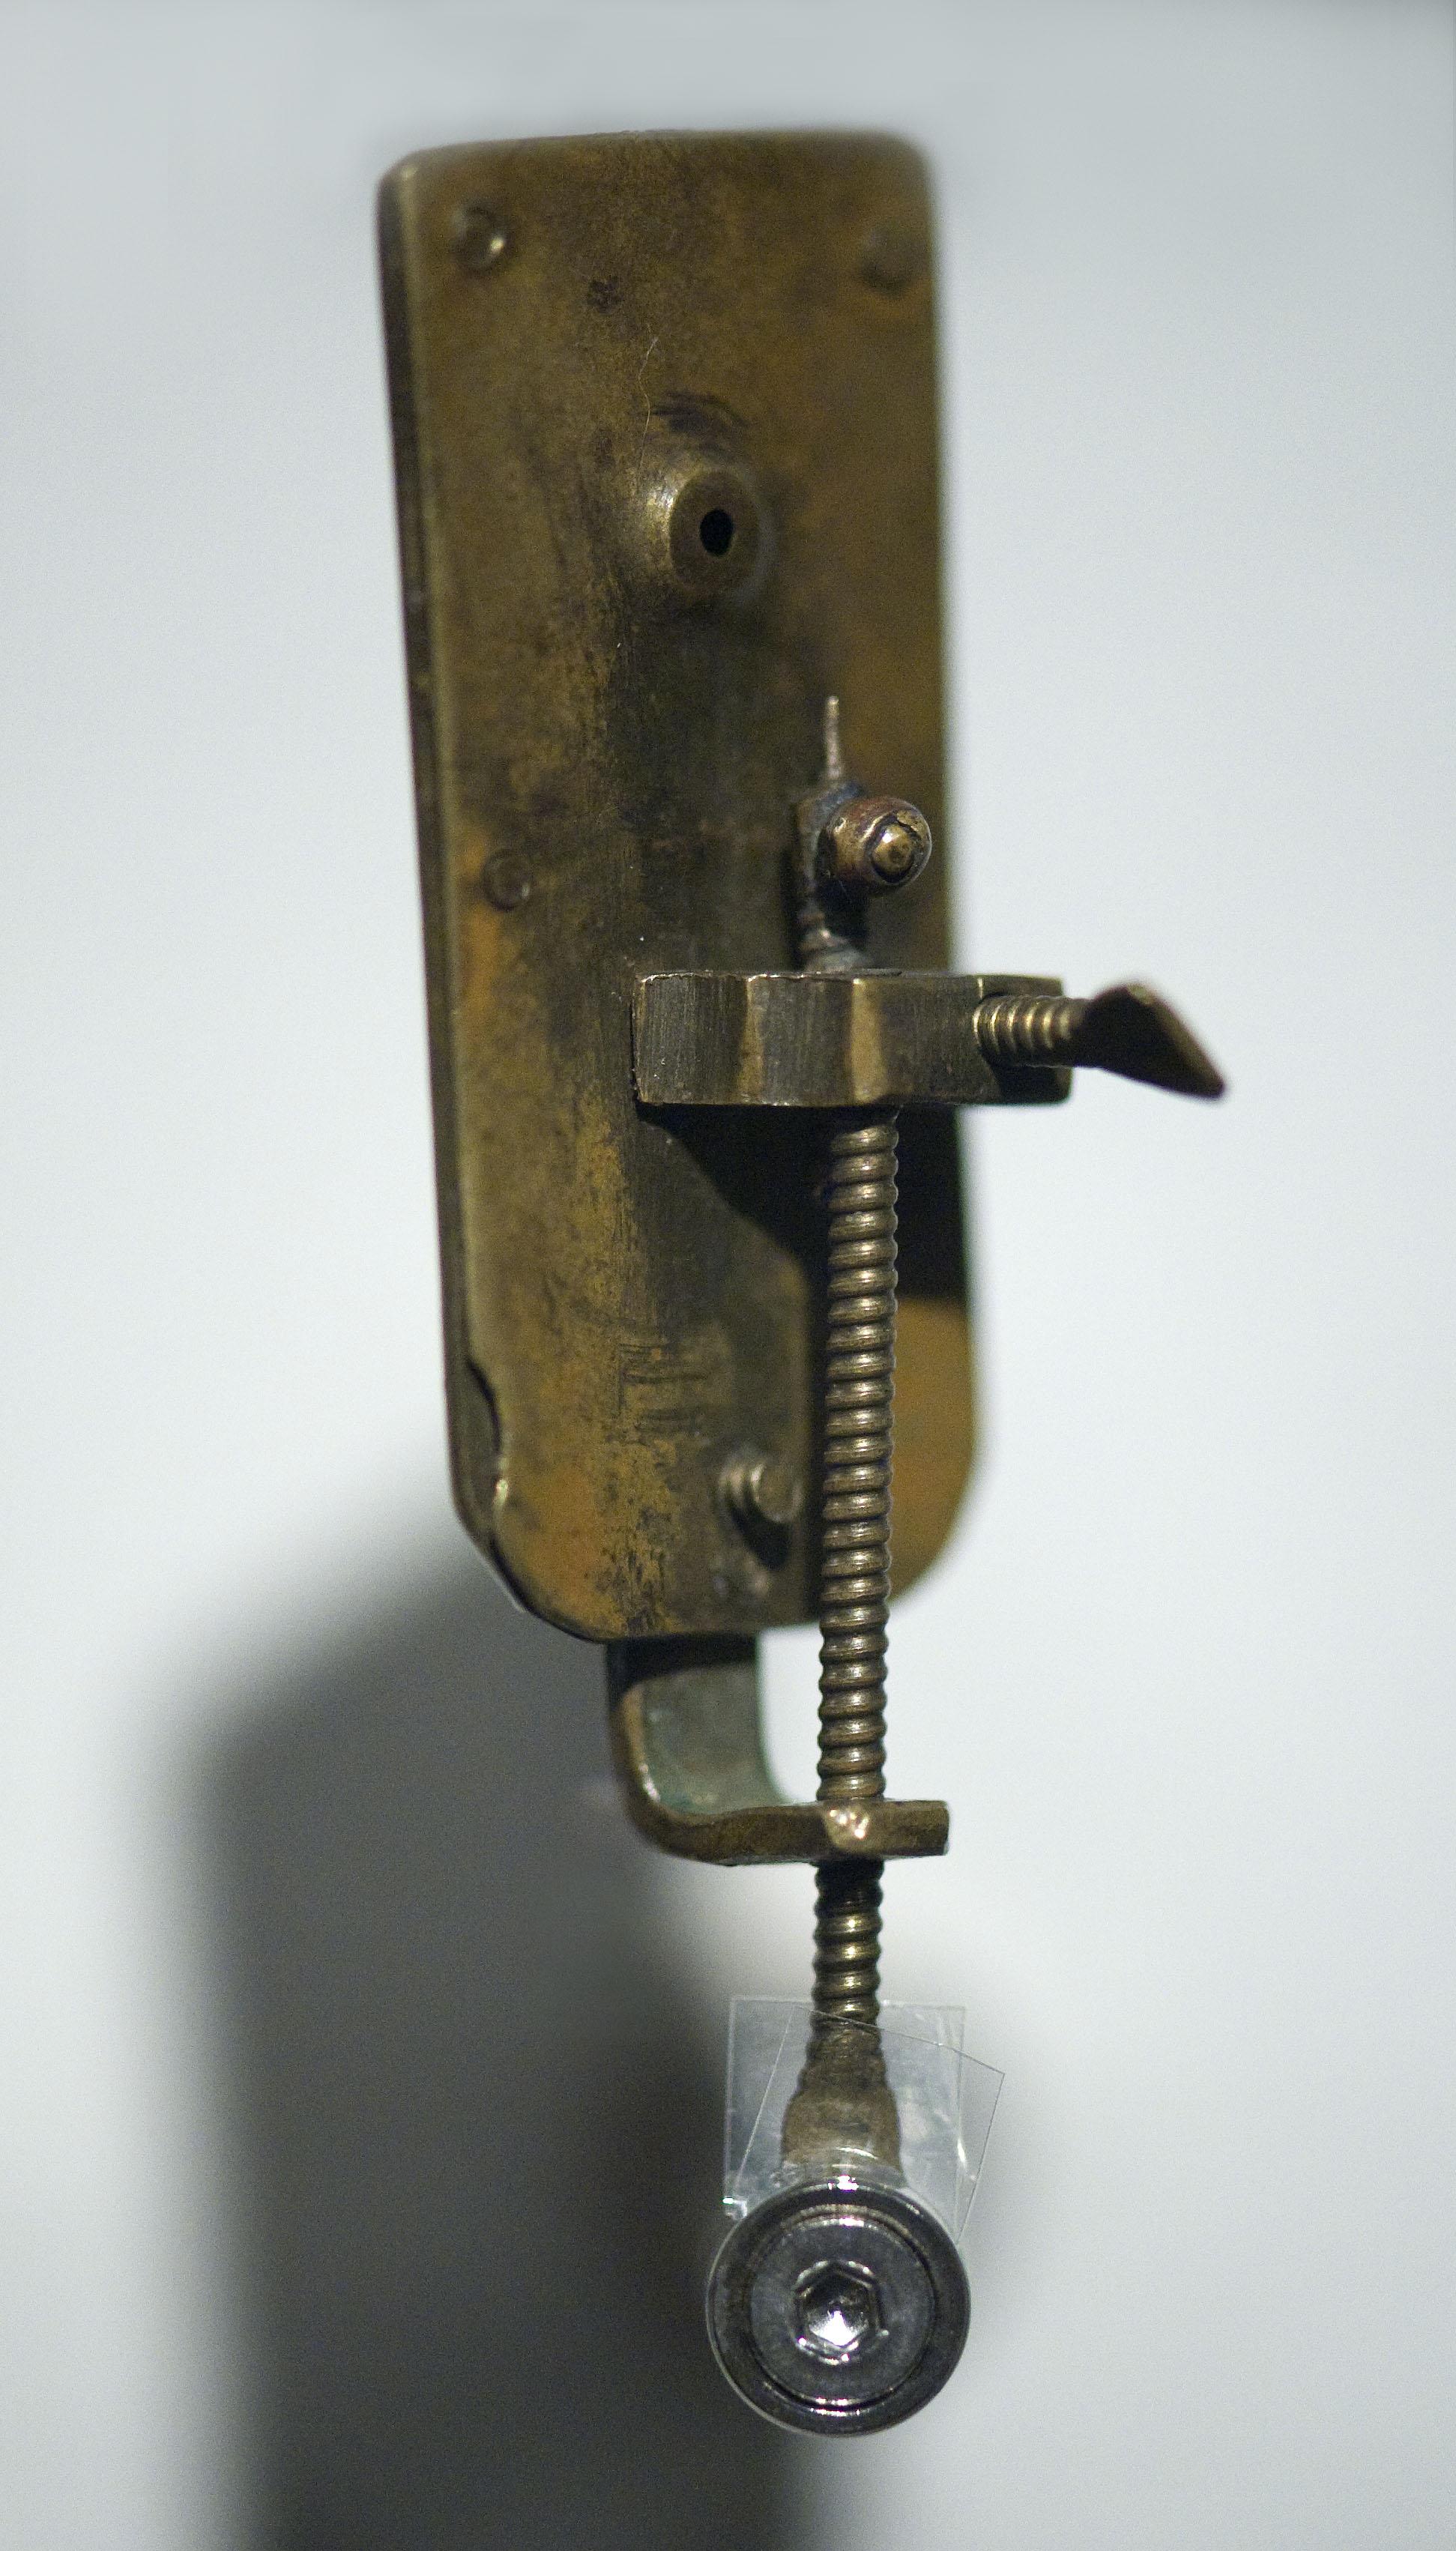 FileSingle Lens Microscope 1690 Haaxman Dirk Museum